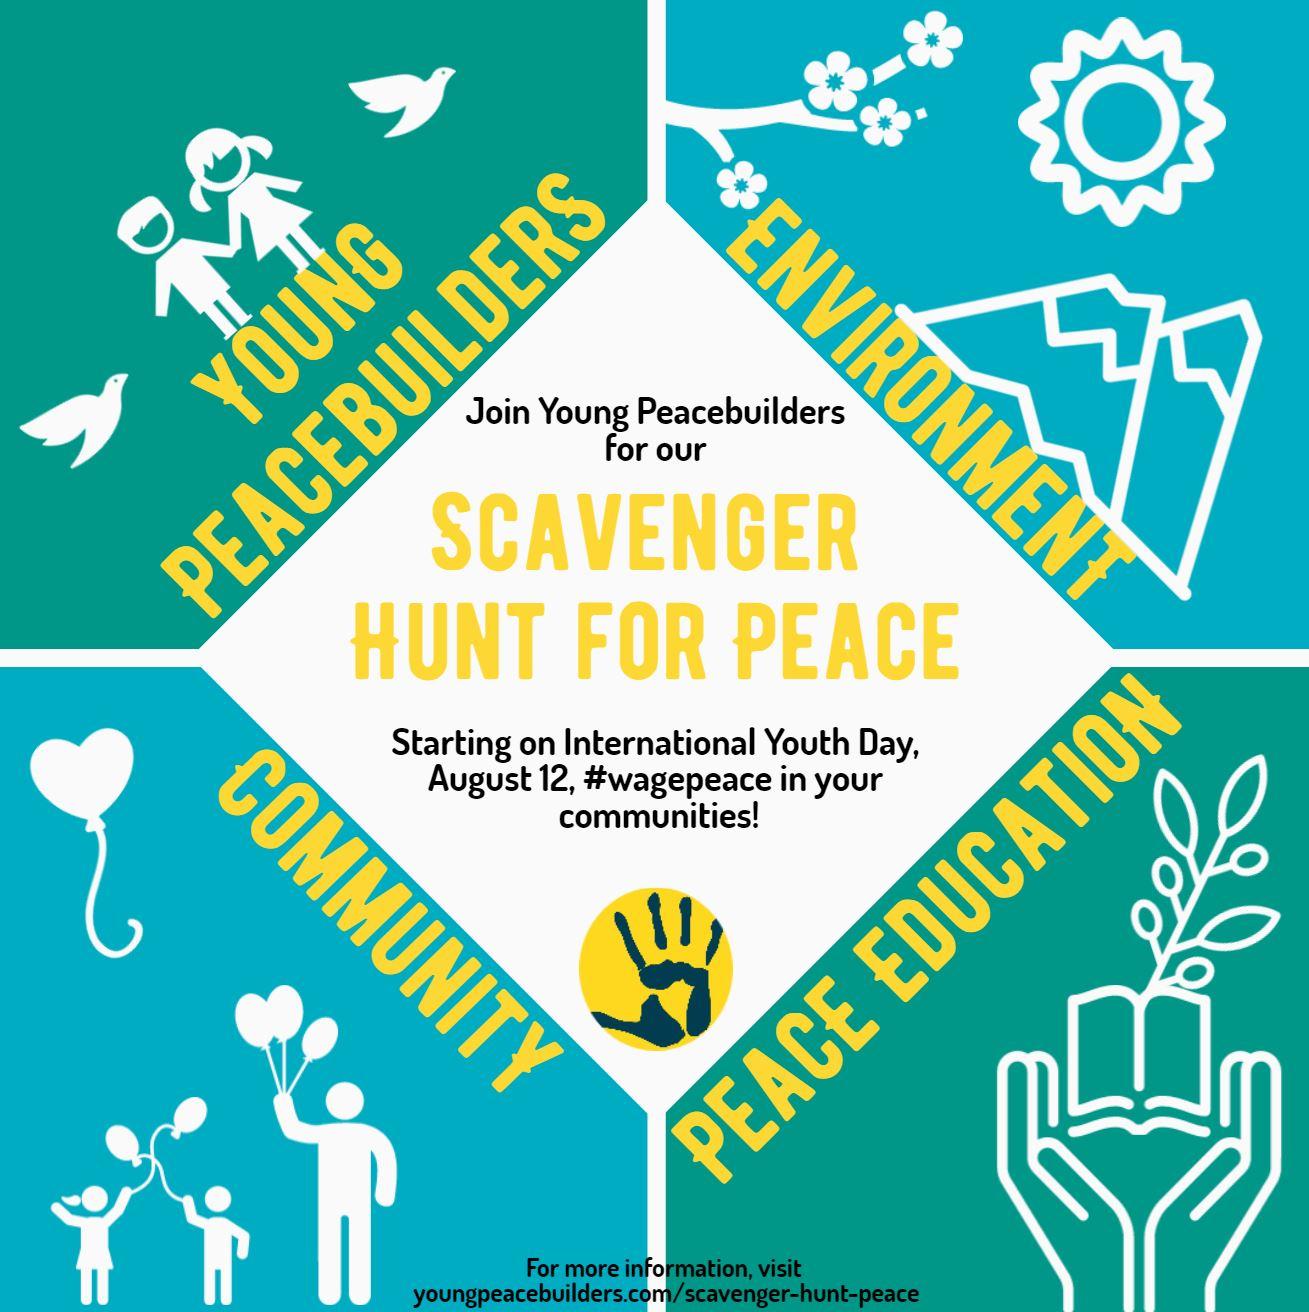 Scavenger Hunt List >> Scavenger Hunt for Peace - Young Peacebuilders